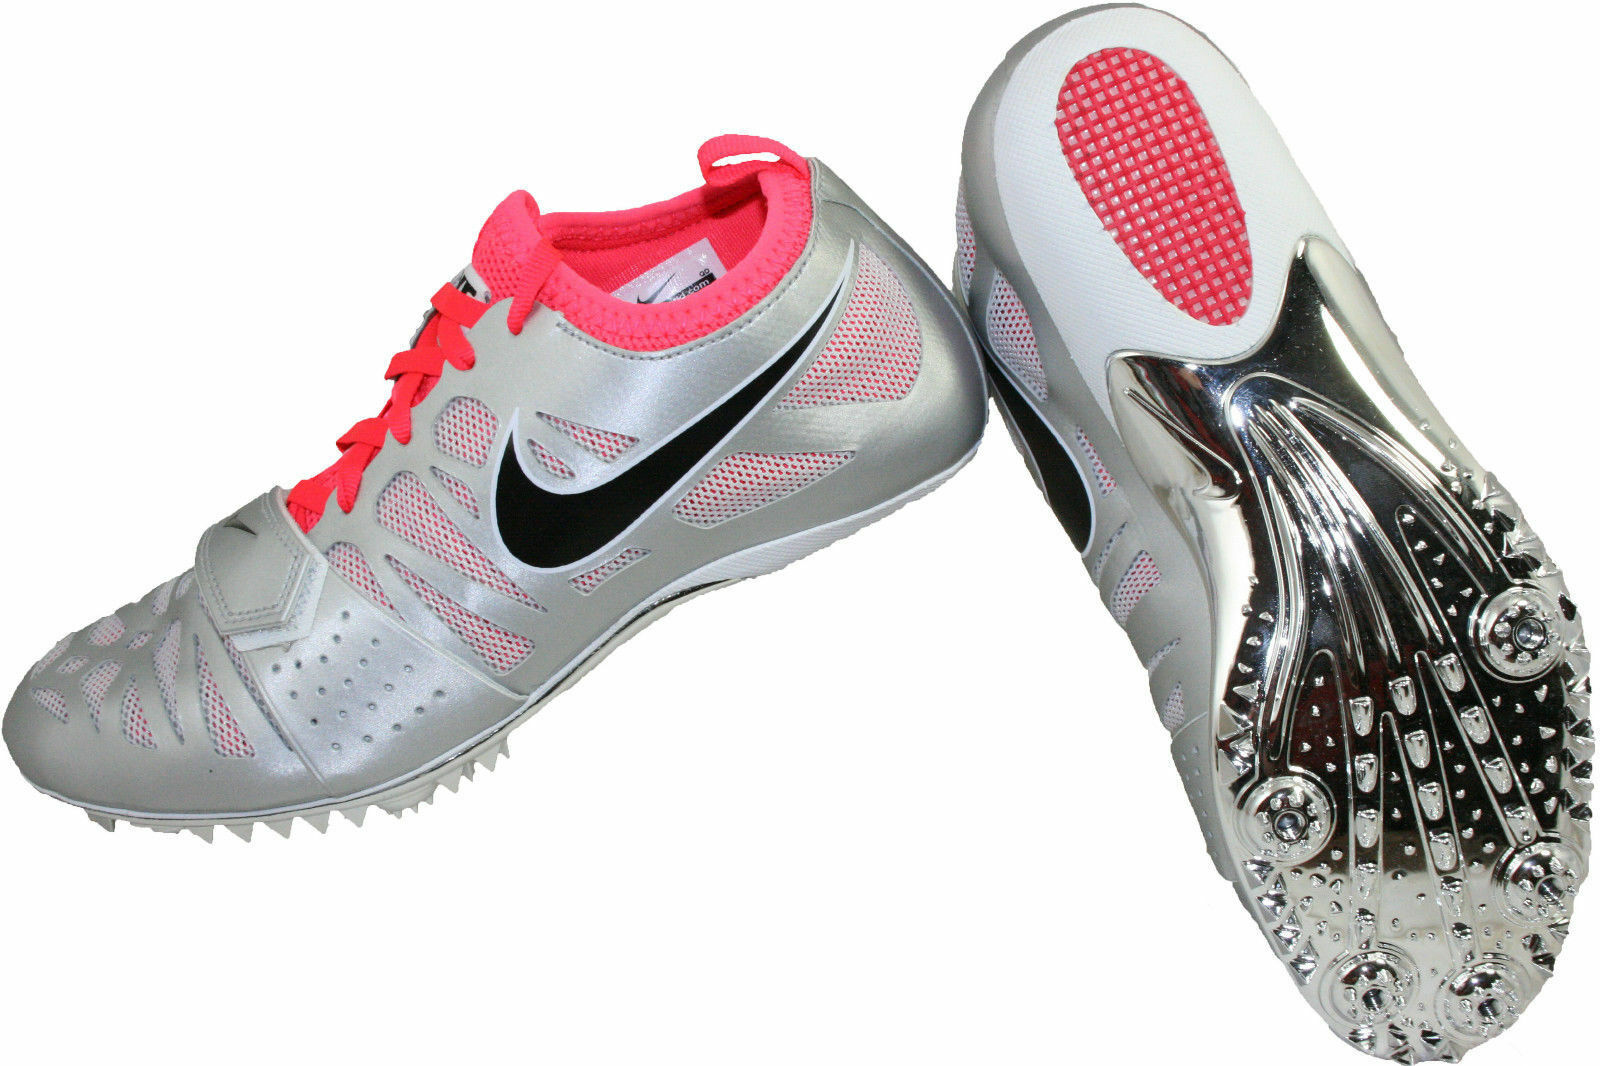 NEW Womens Nike Zoom Celar 4 Track Cleat 456816-006 size WOMENS 12 NWOB 29 CM